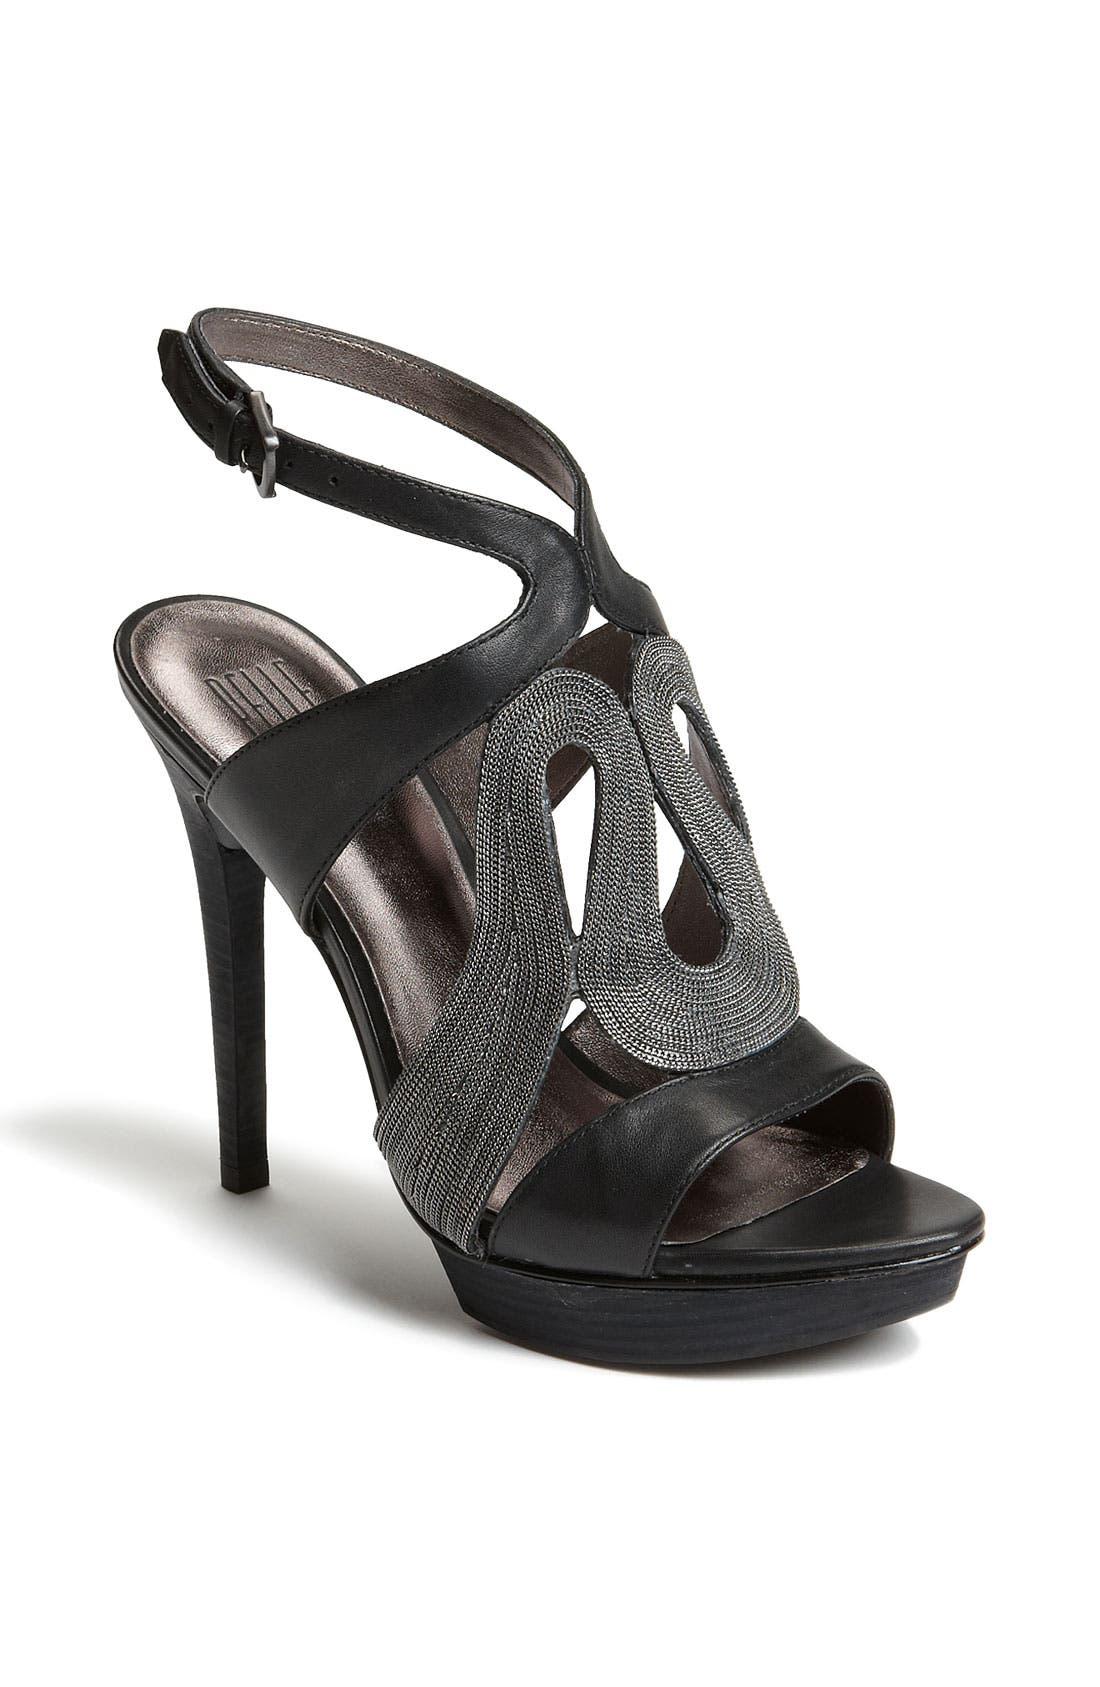 Main Image - Pelle Moda 'Shila' Platform Sandal